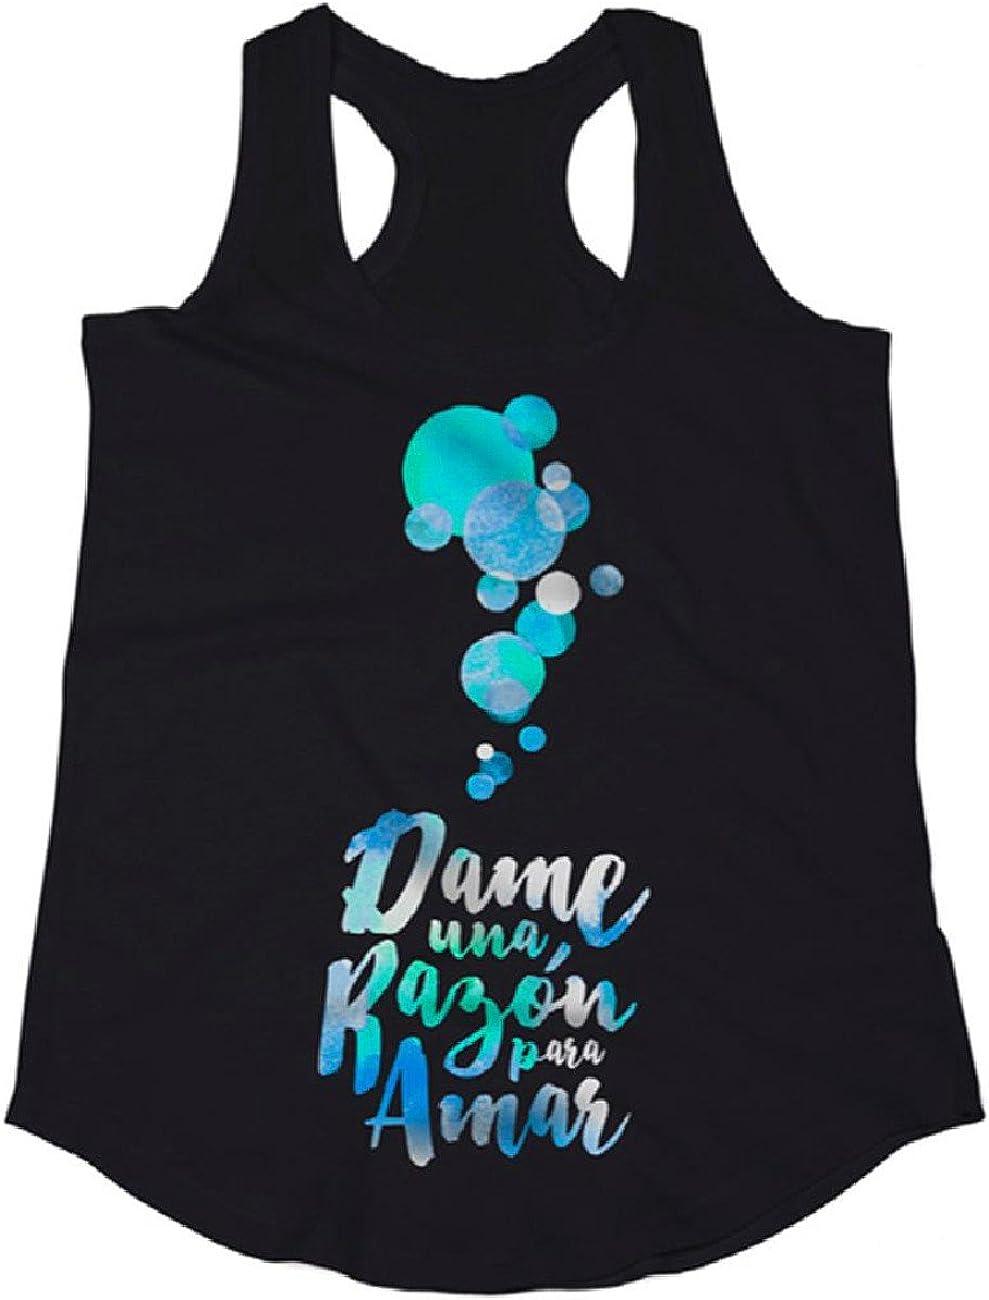 onstage 708-9140-XL-Negro - Camiseta Tirantes Mujer David ...